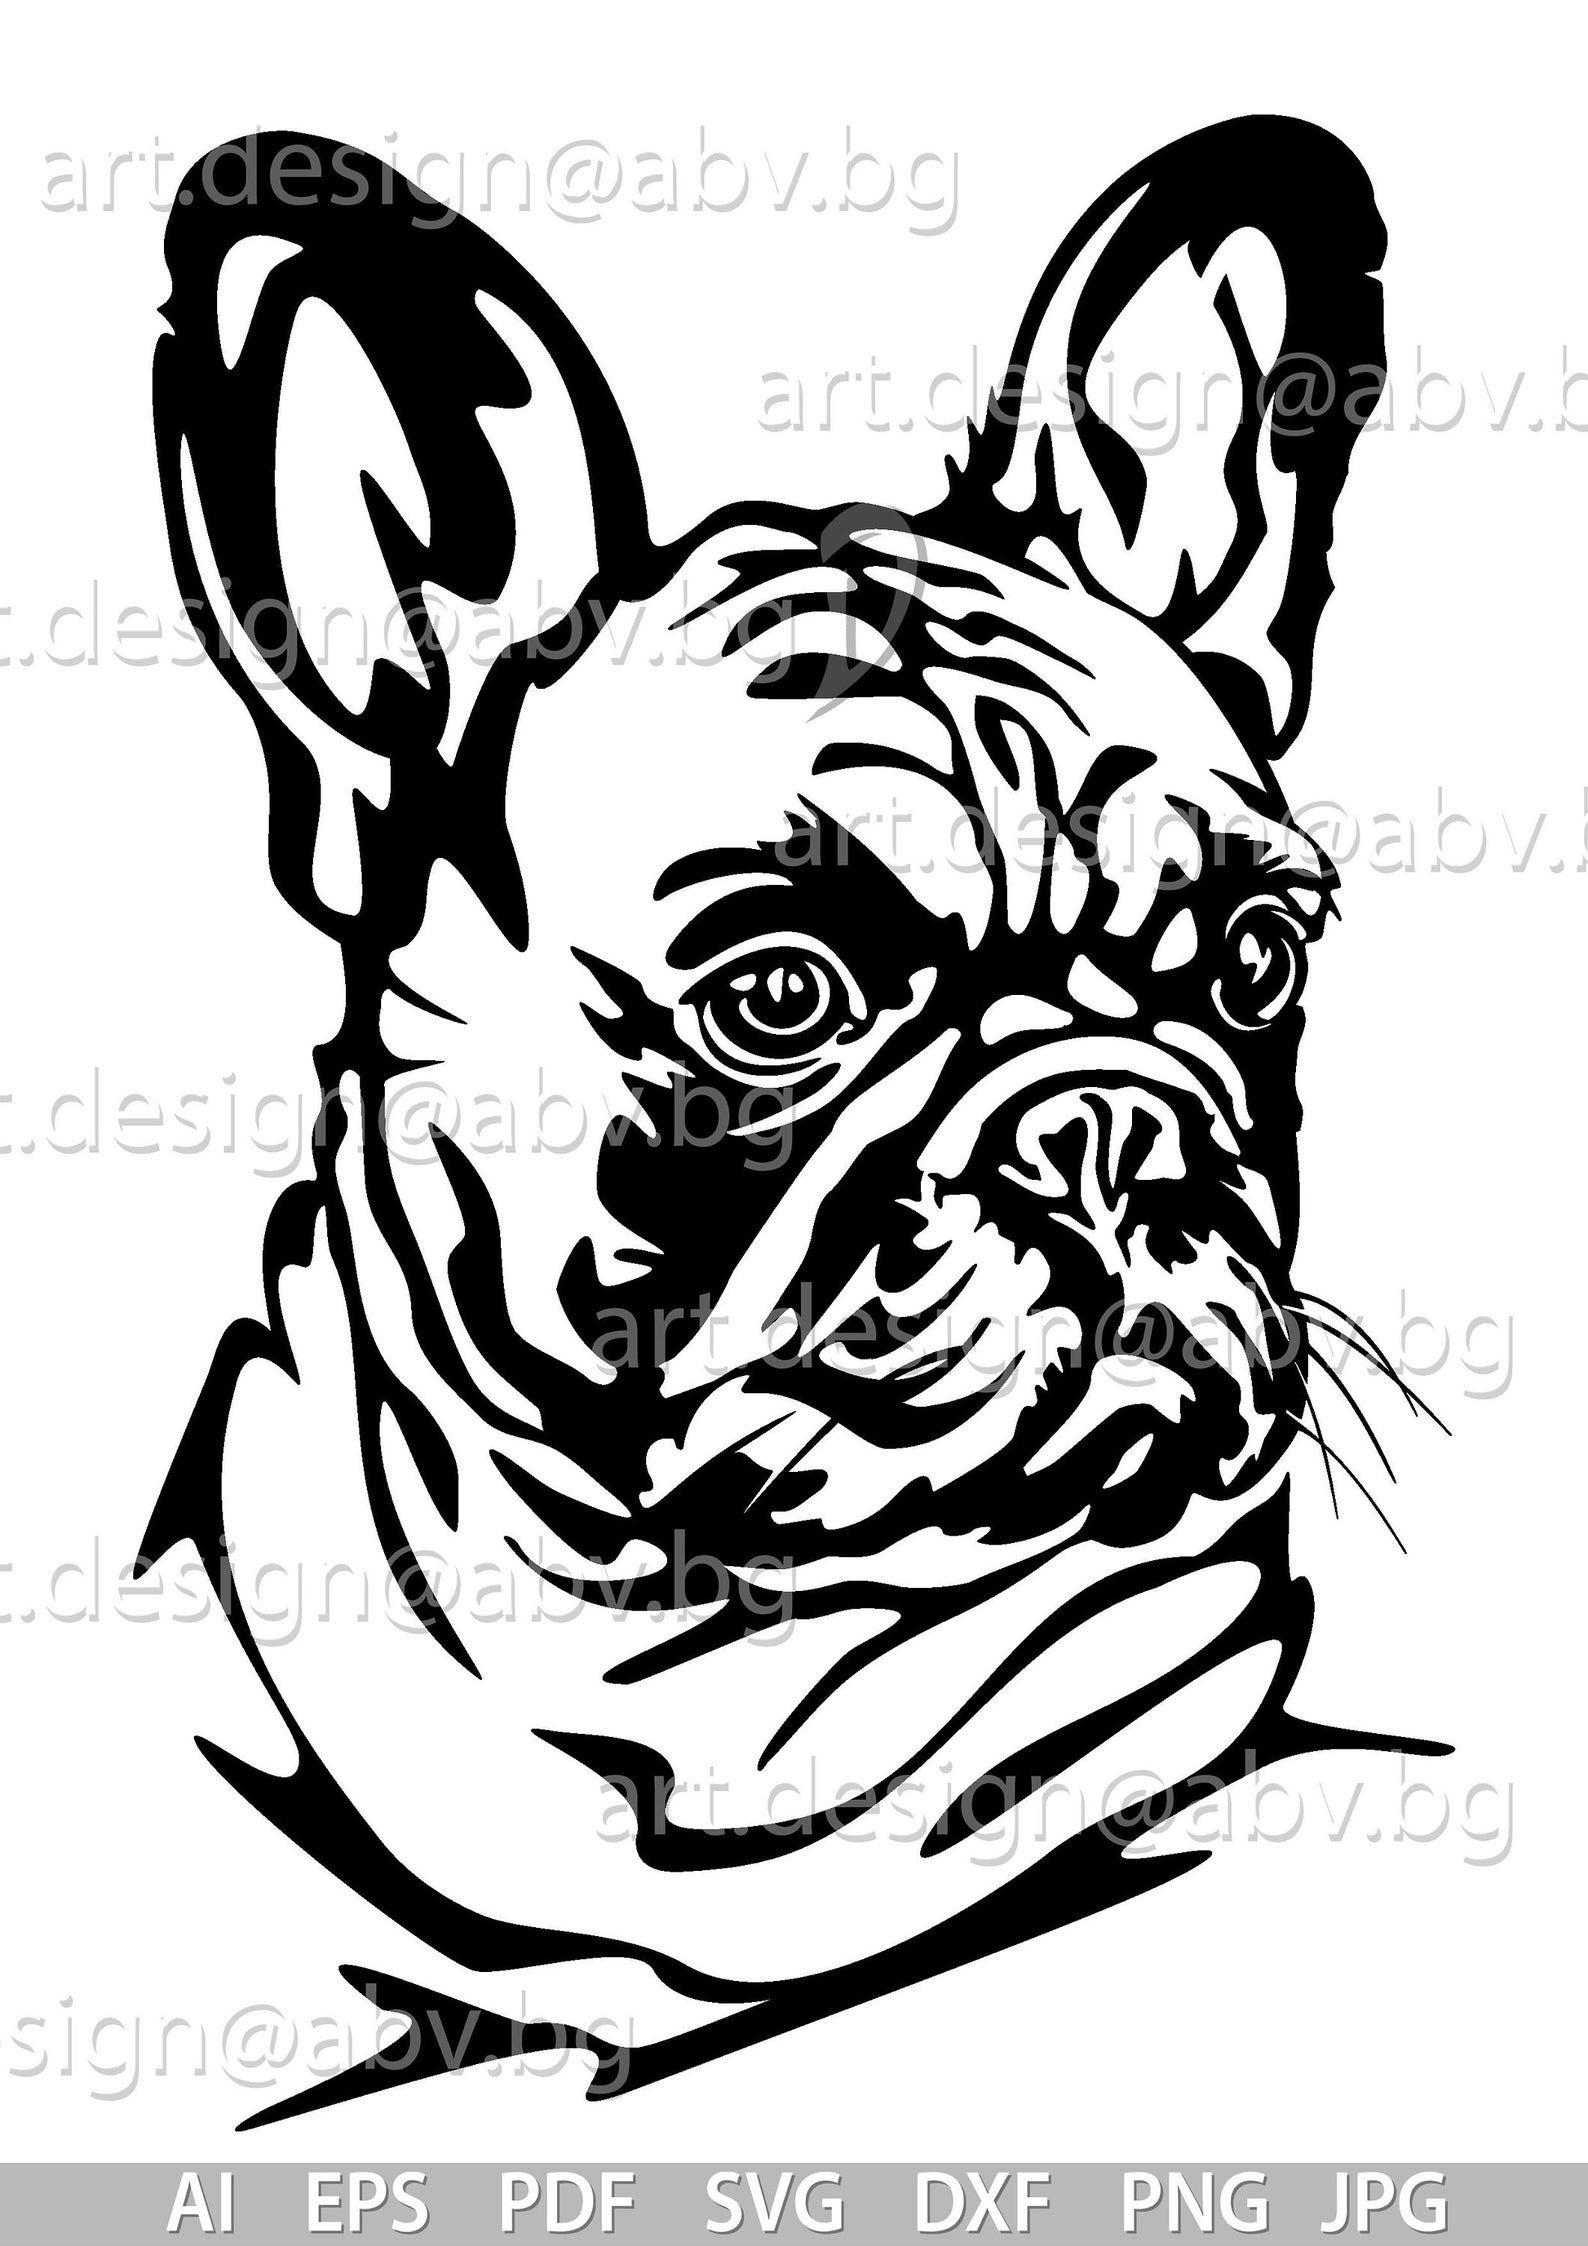 Vector French Bulldog Svg Ai Png Pdf Eps Dxf Jpg Etsy Animal Stencil Art Animal Stencil Bulldog